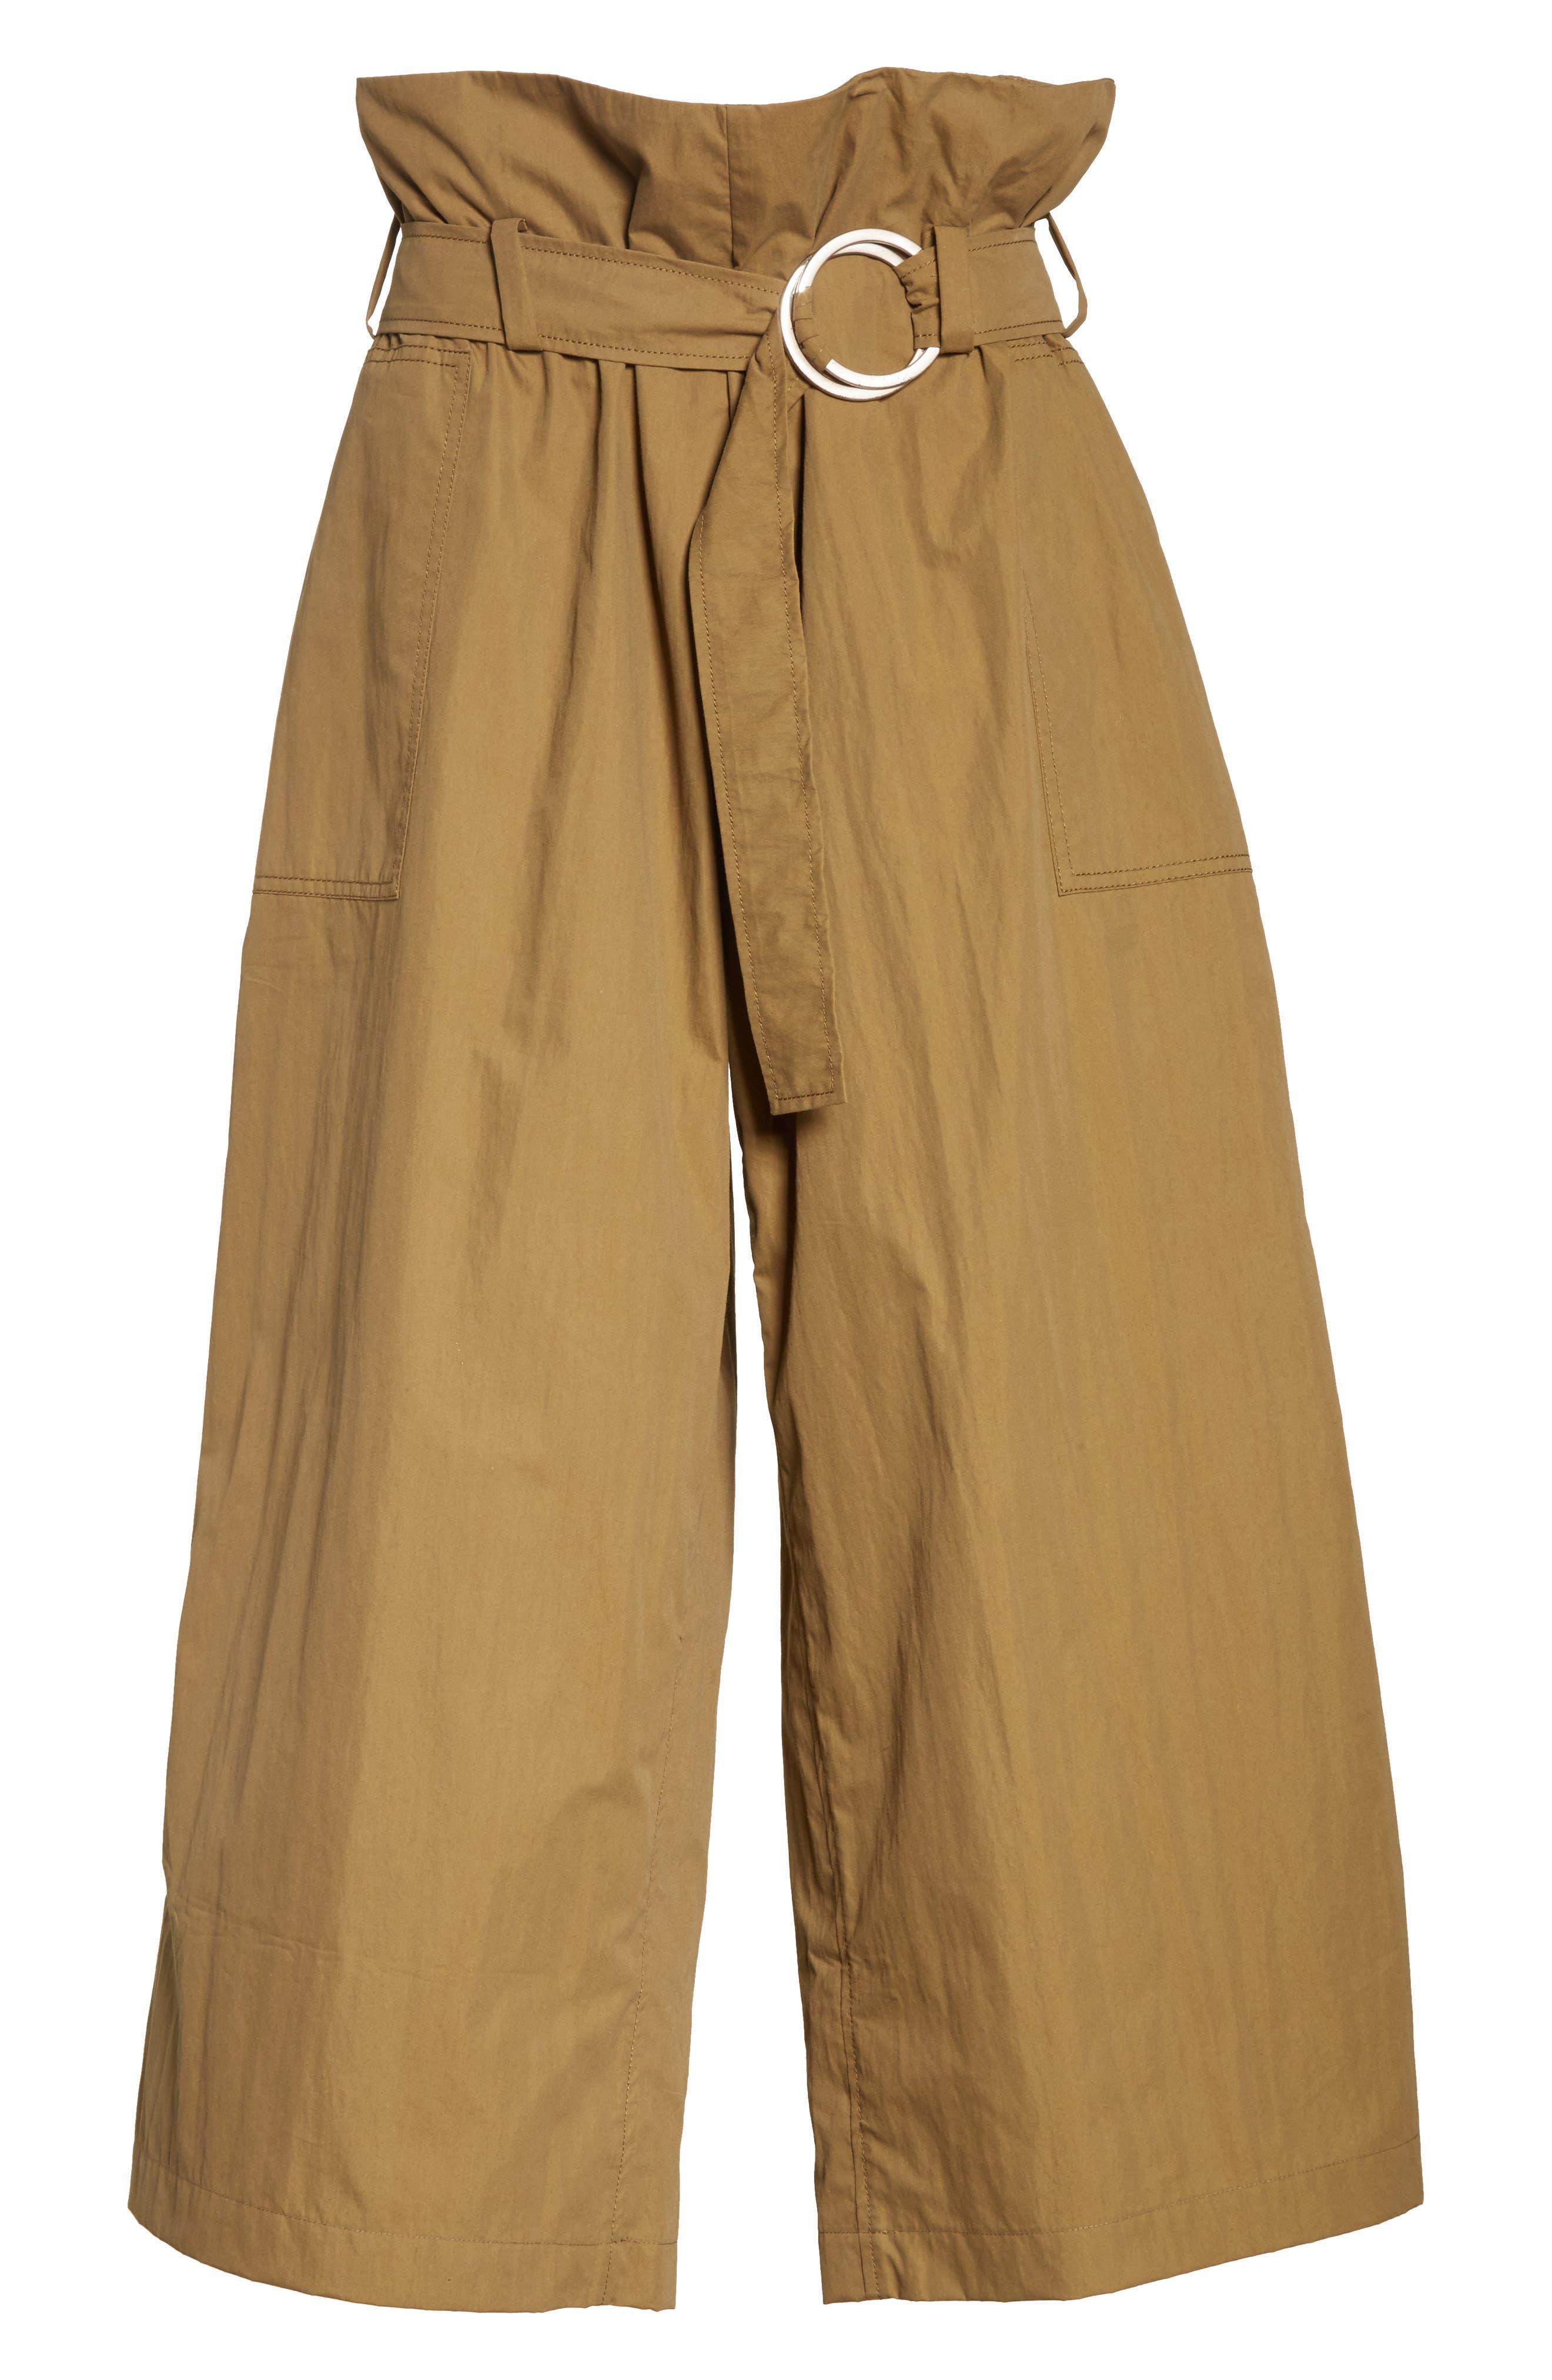 Tilly Belted Paperbag Pants,                             Alternate thumbnail 6, color,                             310